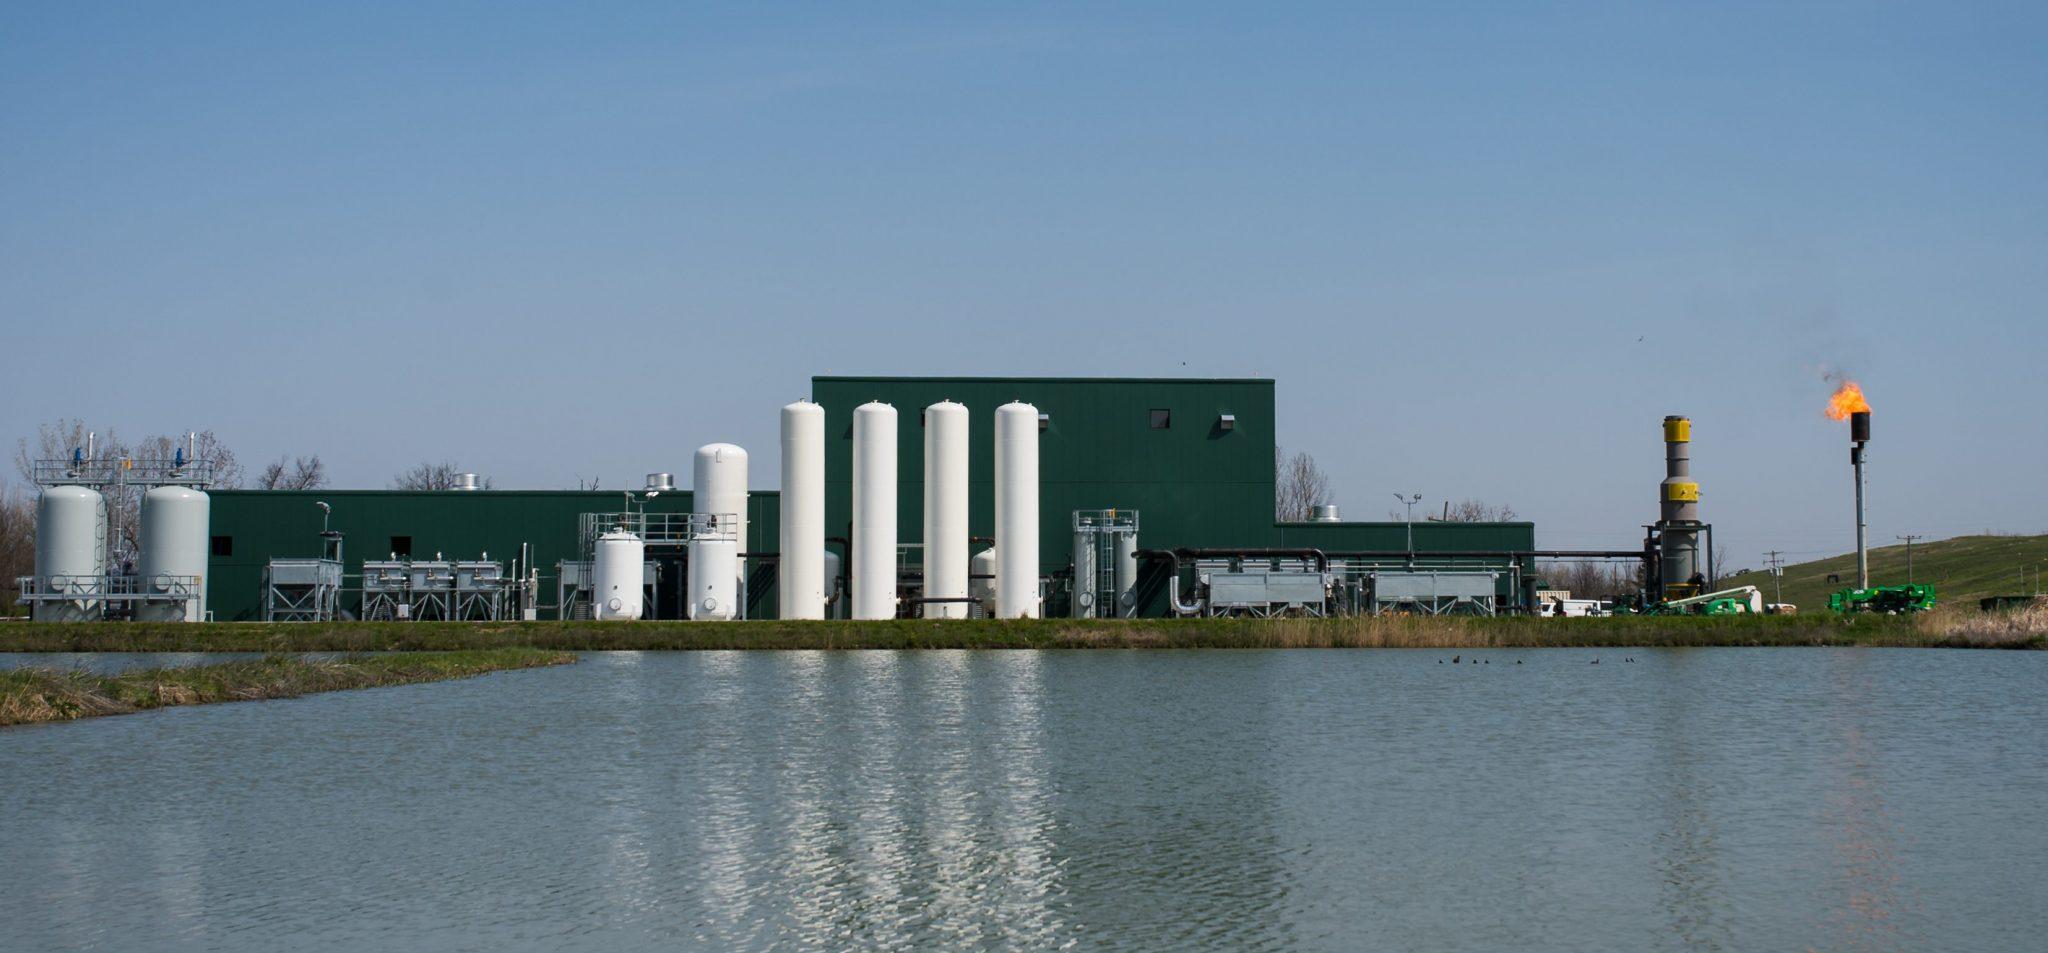 Waste Management- Louisville, Kentucky